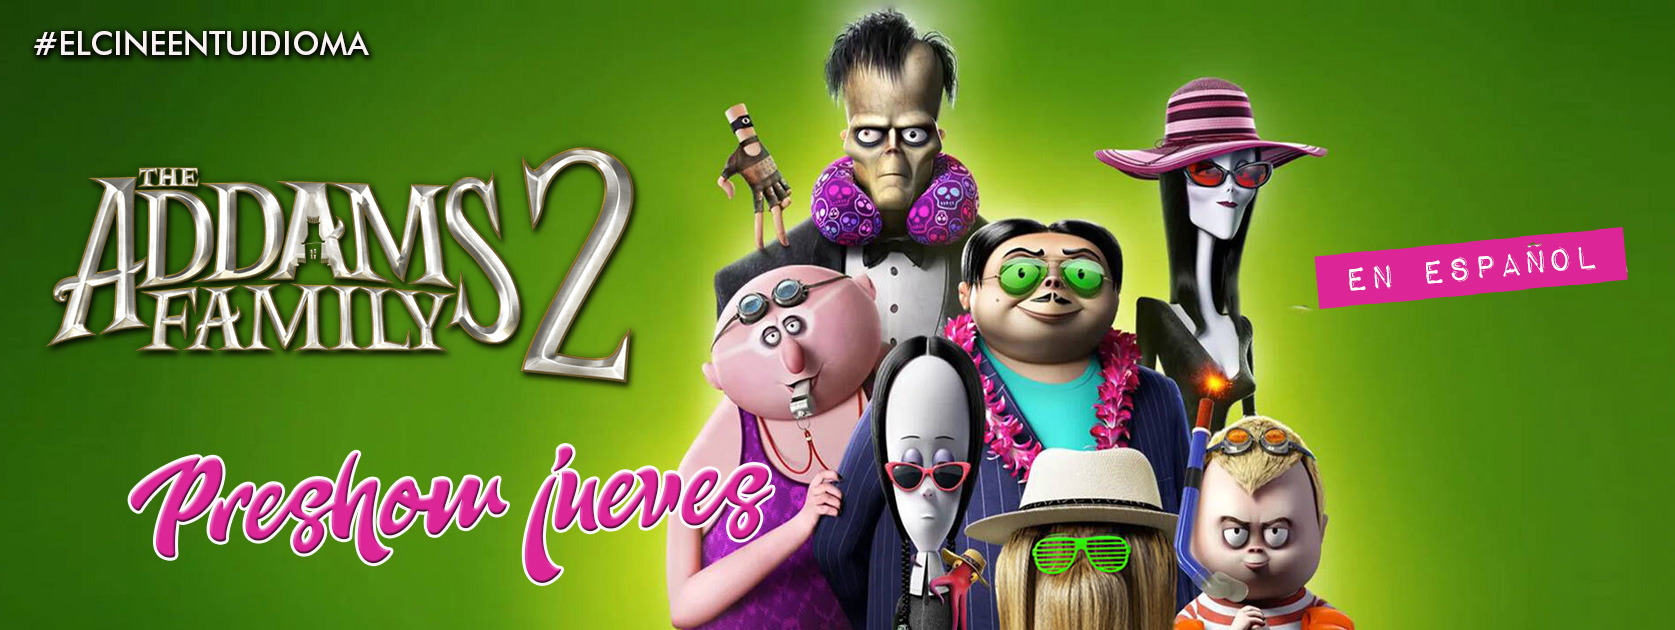 La-Familia-Addams-2-La-gran-escapada